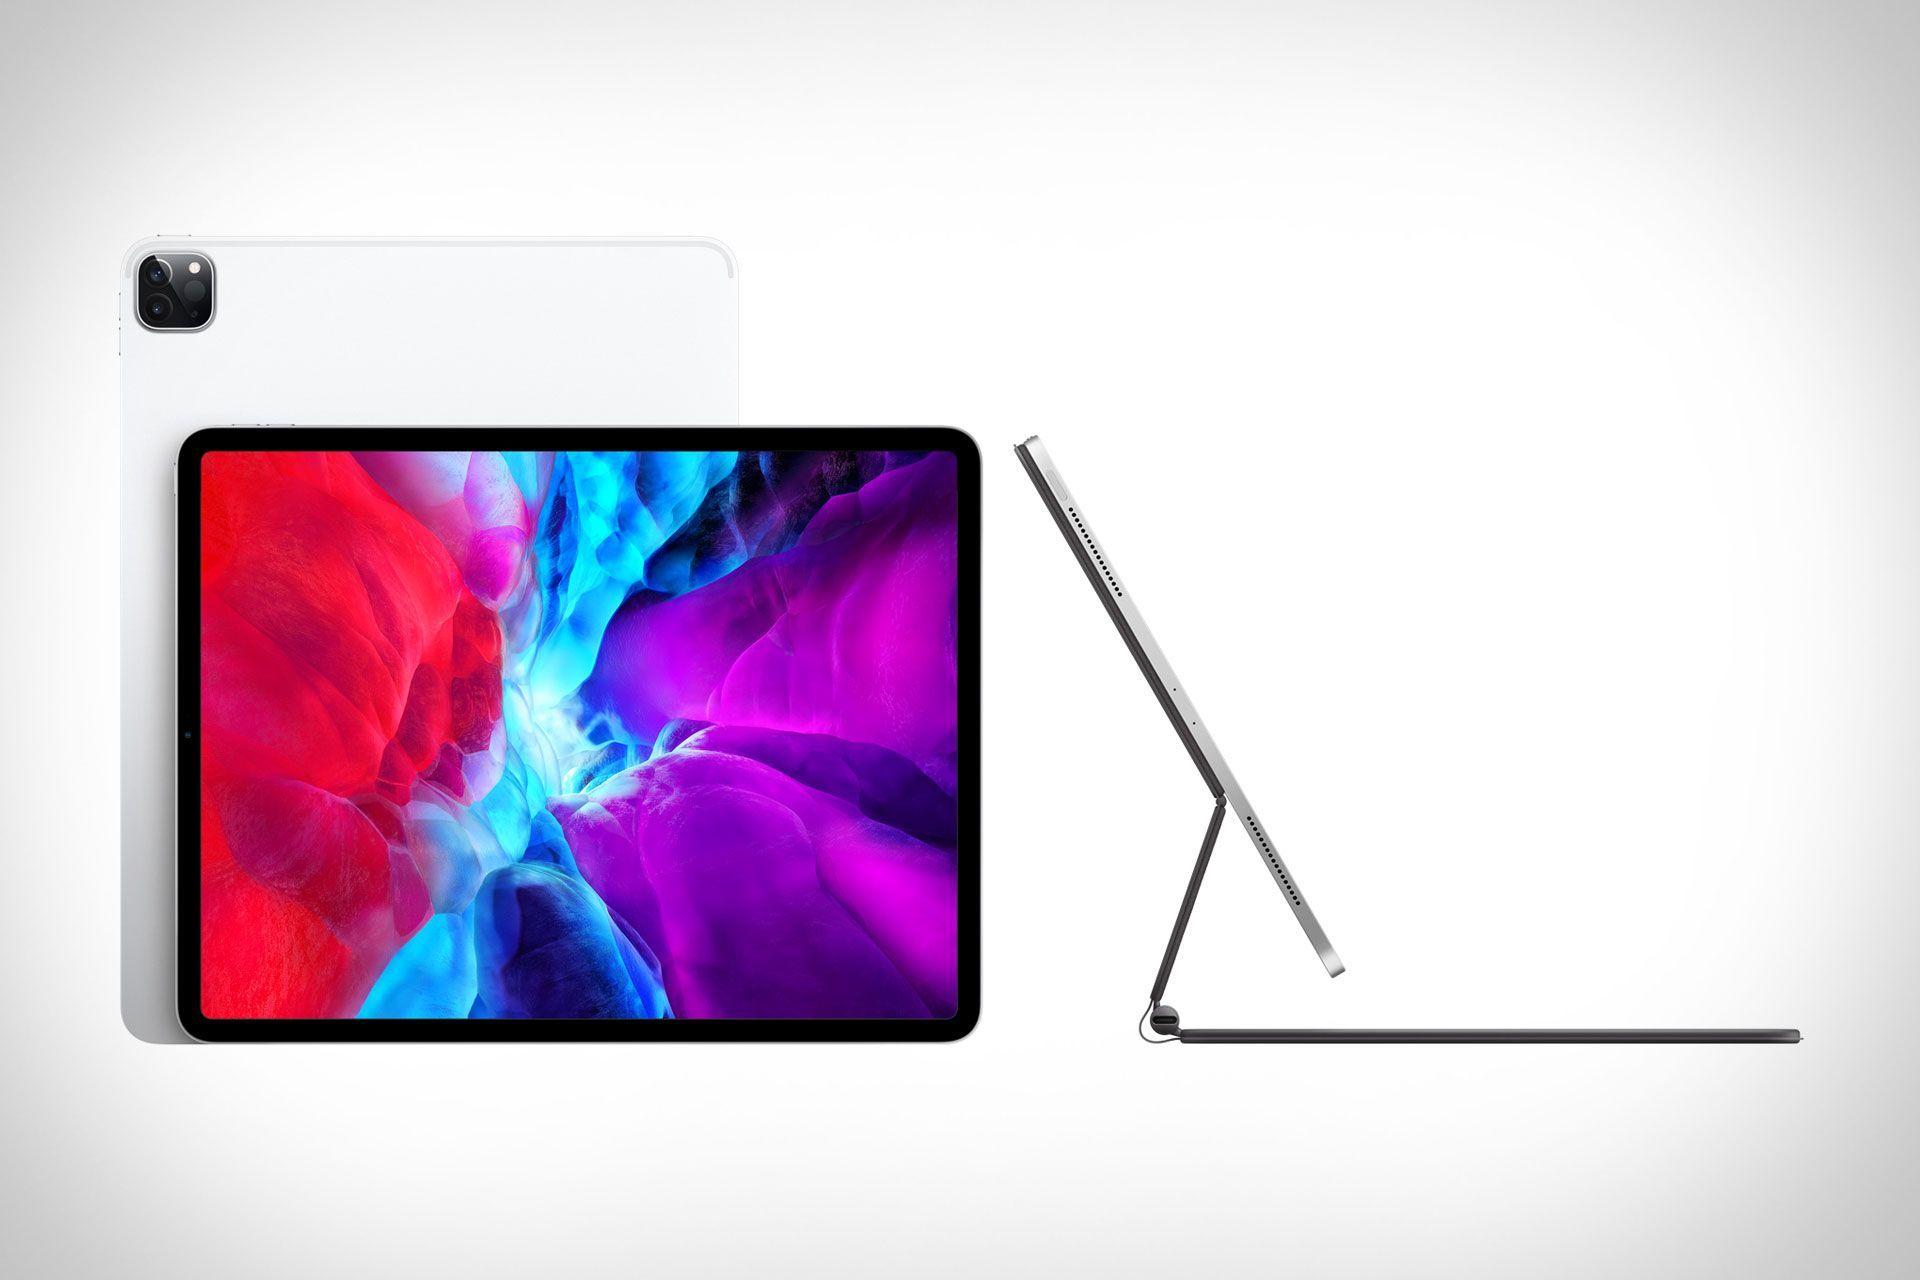 Apple Ipad Pro In 2020 New Ipad Pro Ipad Pro Apple Ipad